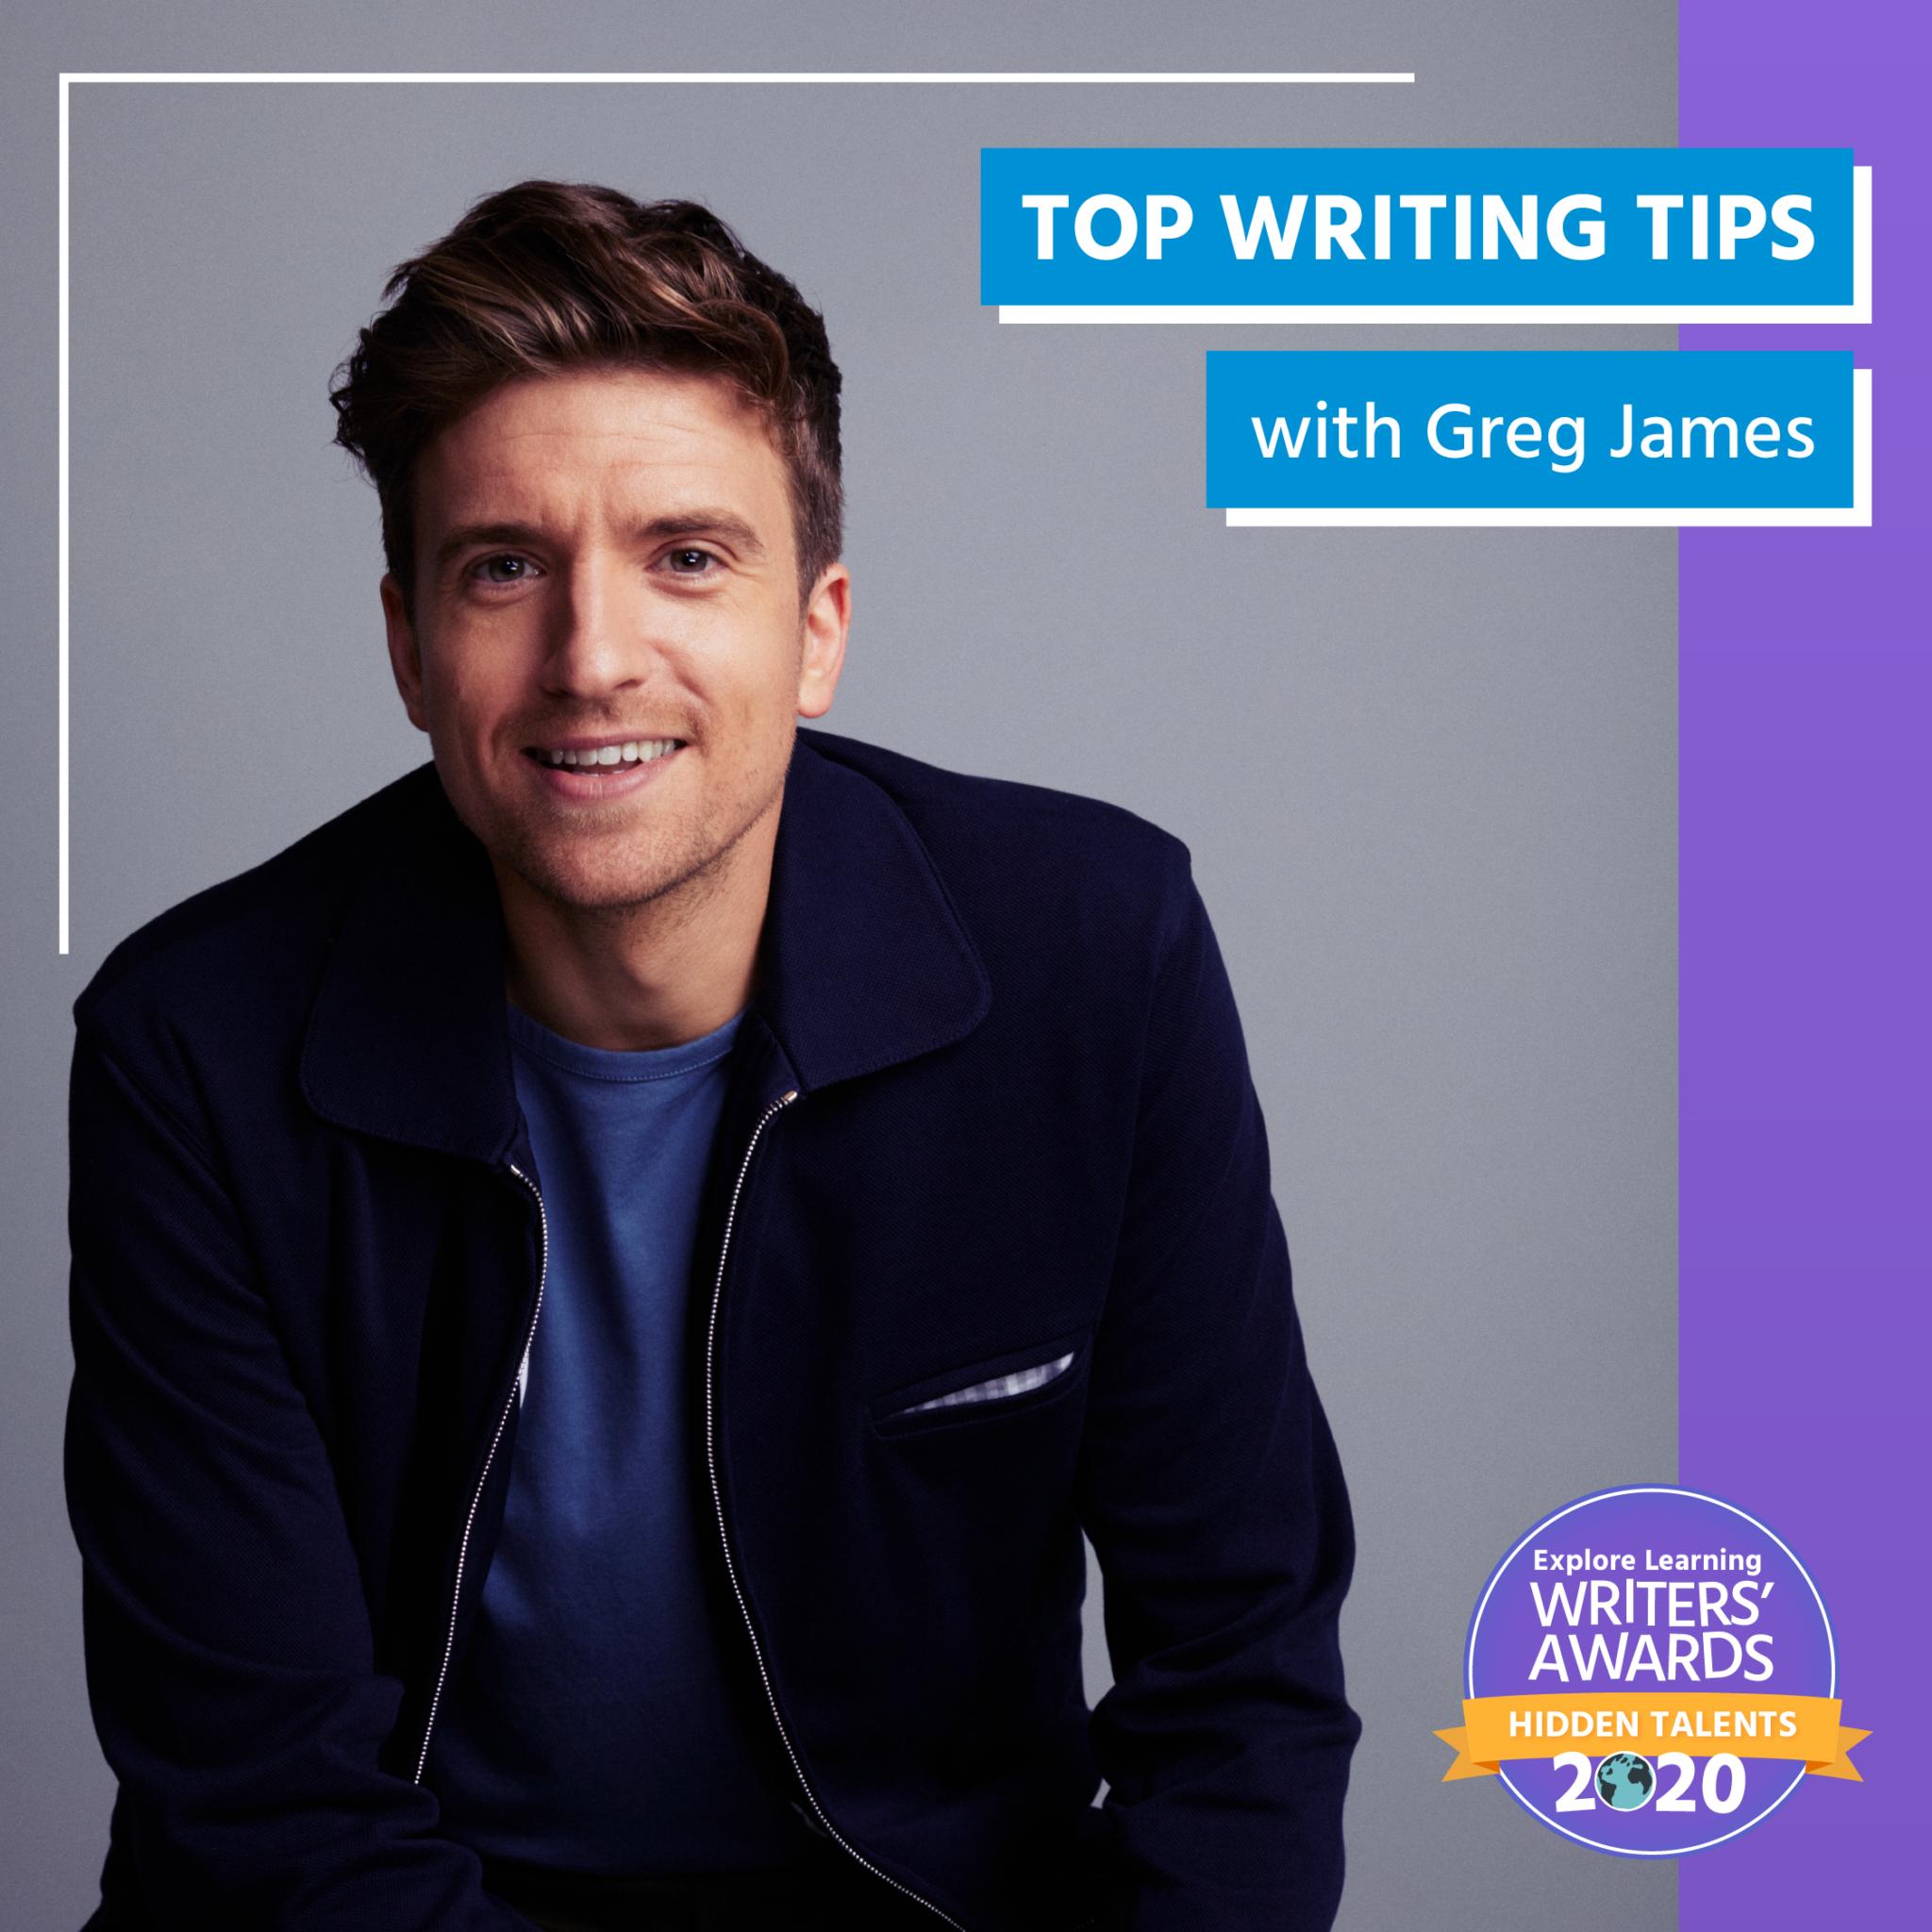 Greg James' Writing Wisdom